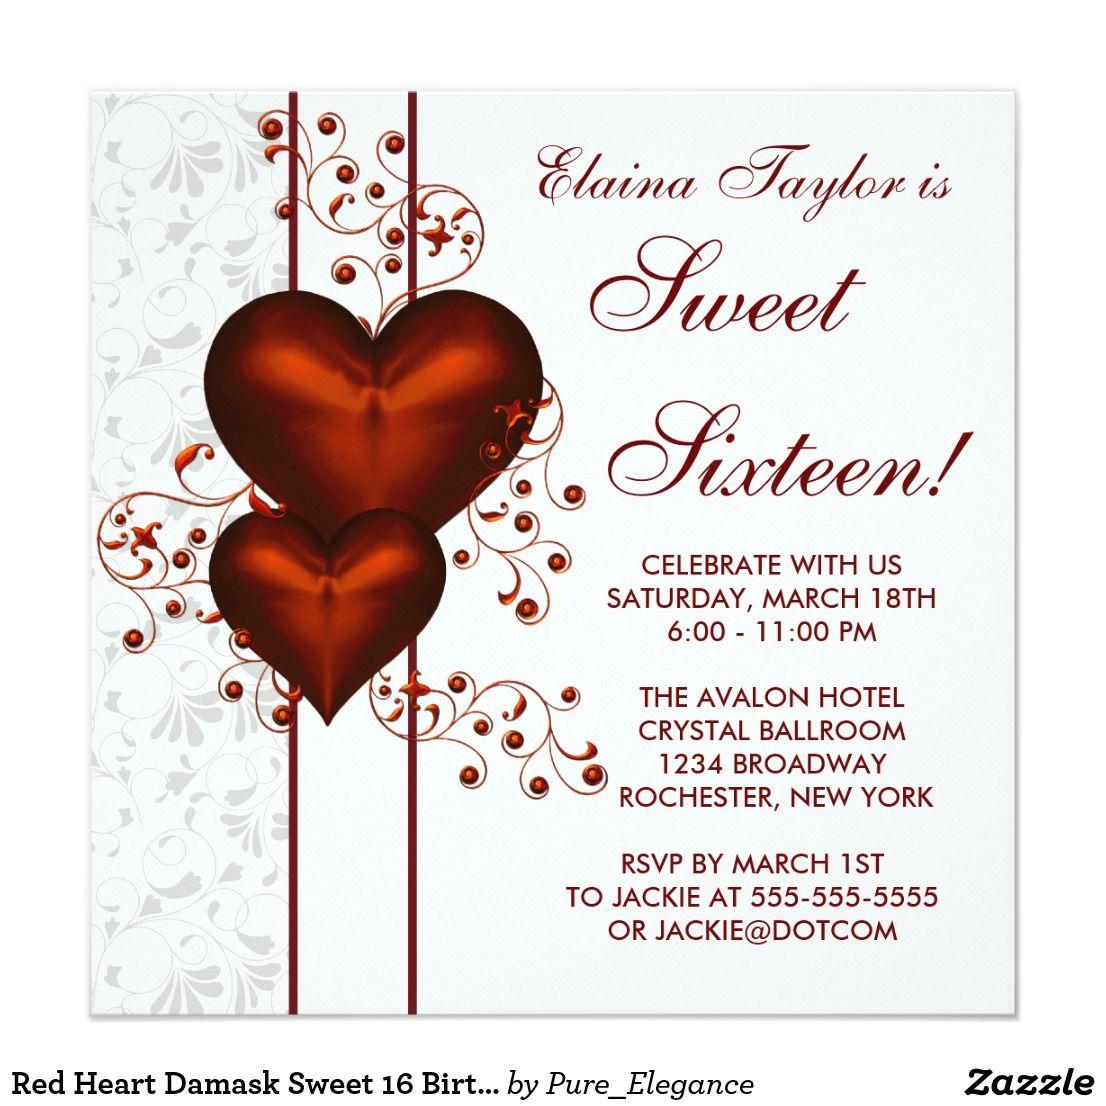 Red Heart Damask Sweet 16 Birthday Party Invitation | Pinterest ...